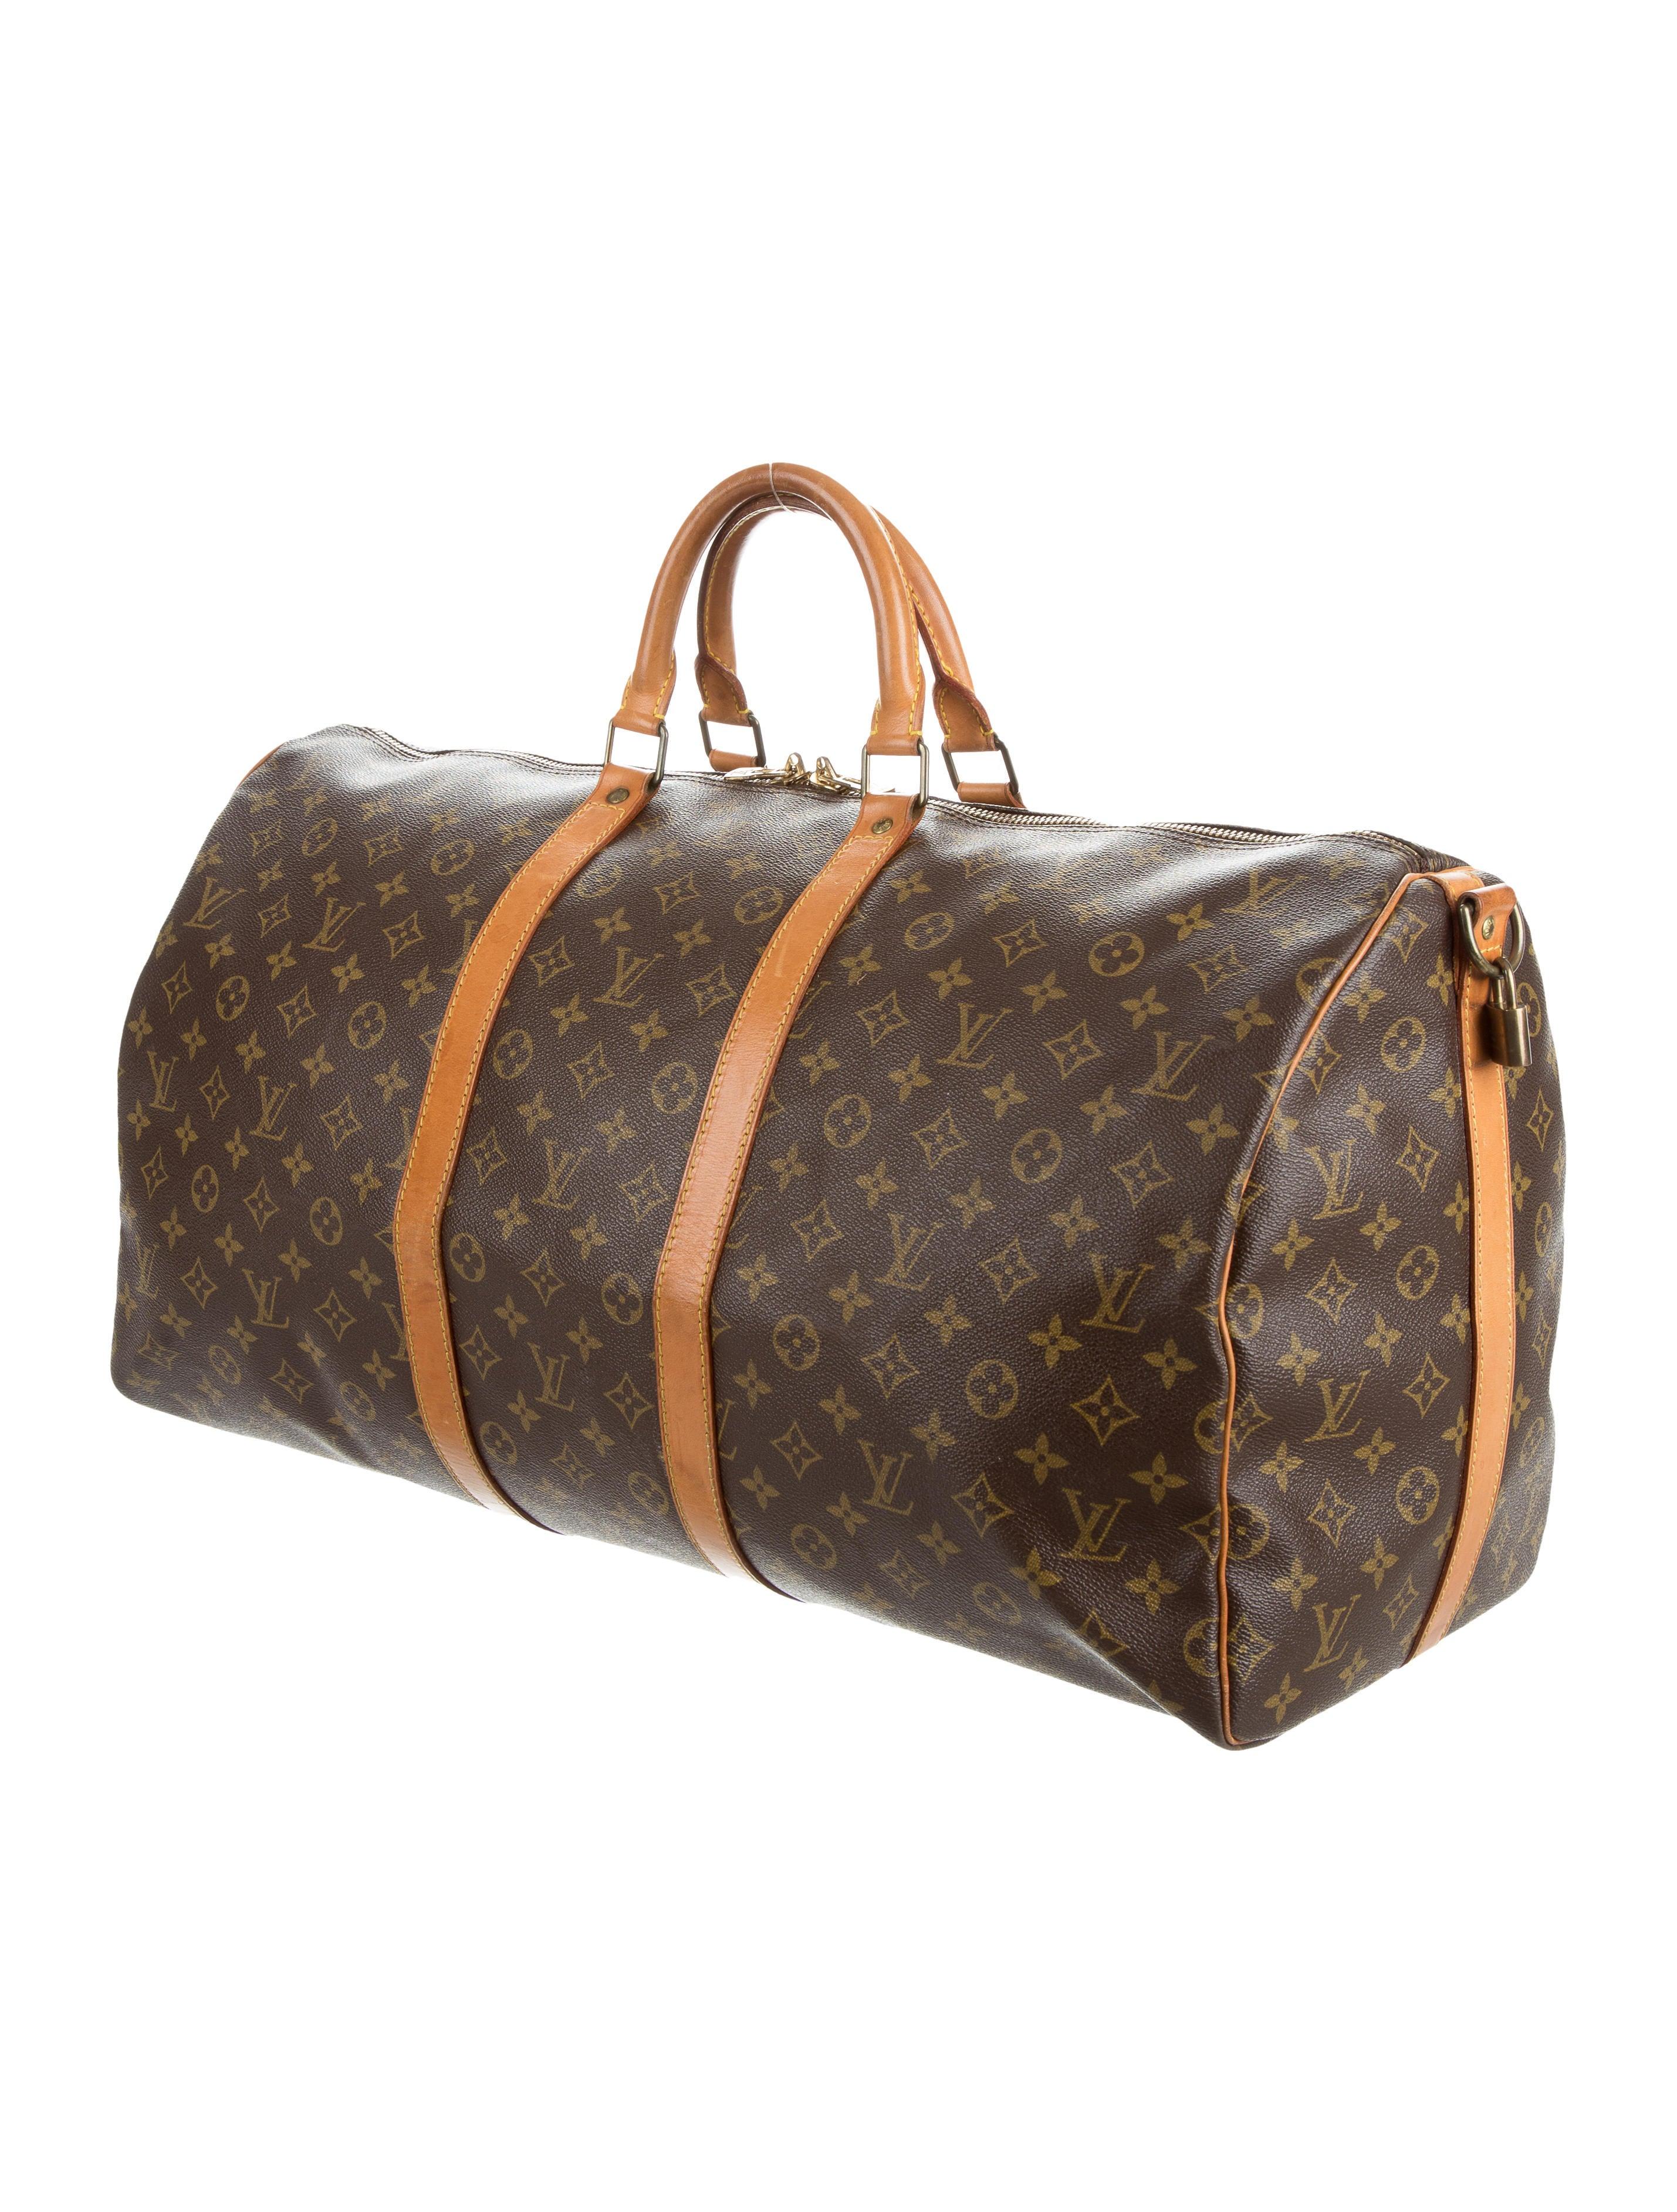 louis vuitton monogram keepall bandouli re 55 handbags. Black Bedroom Furniture Sets. Home Design Ideas